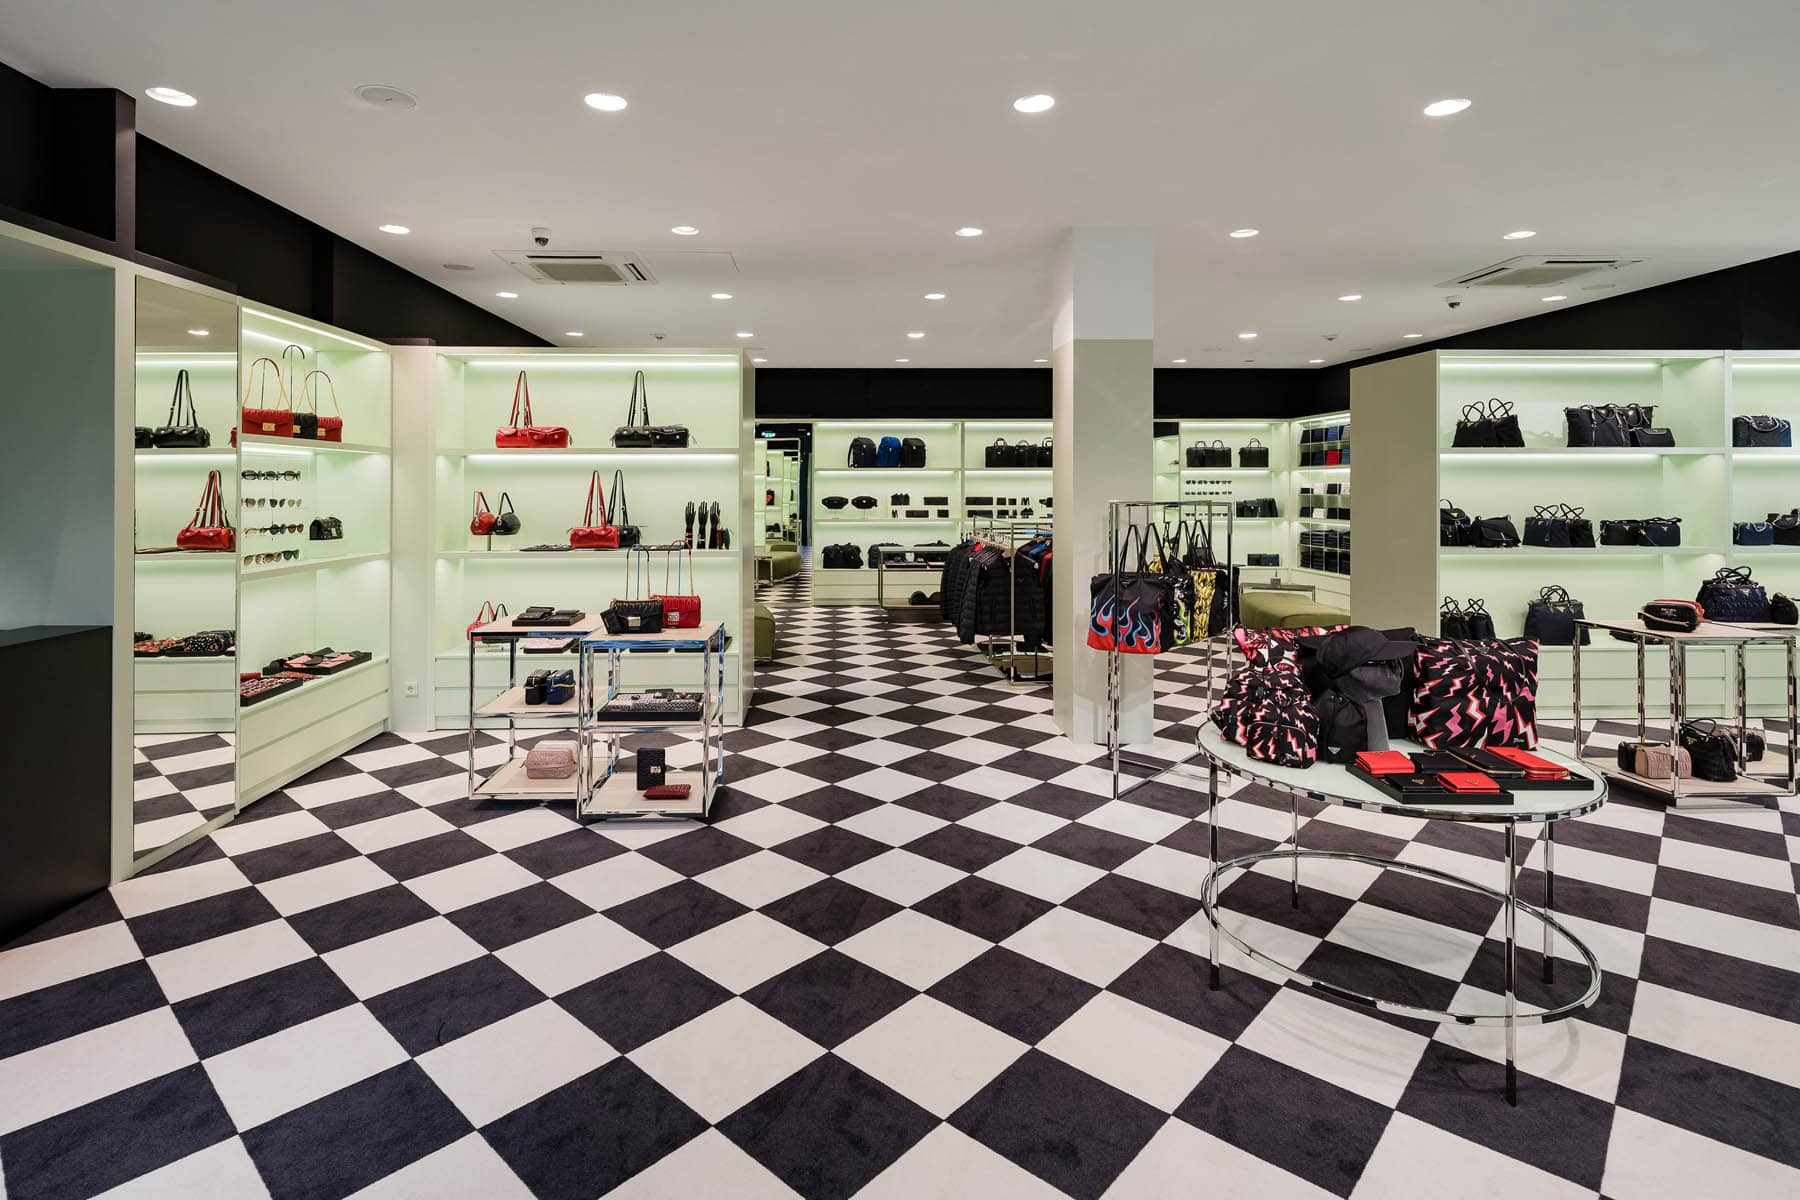 Interieurfotografie im Prada Store